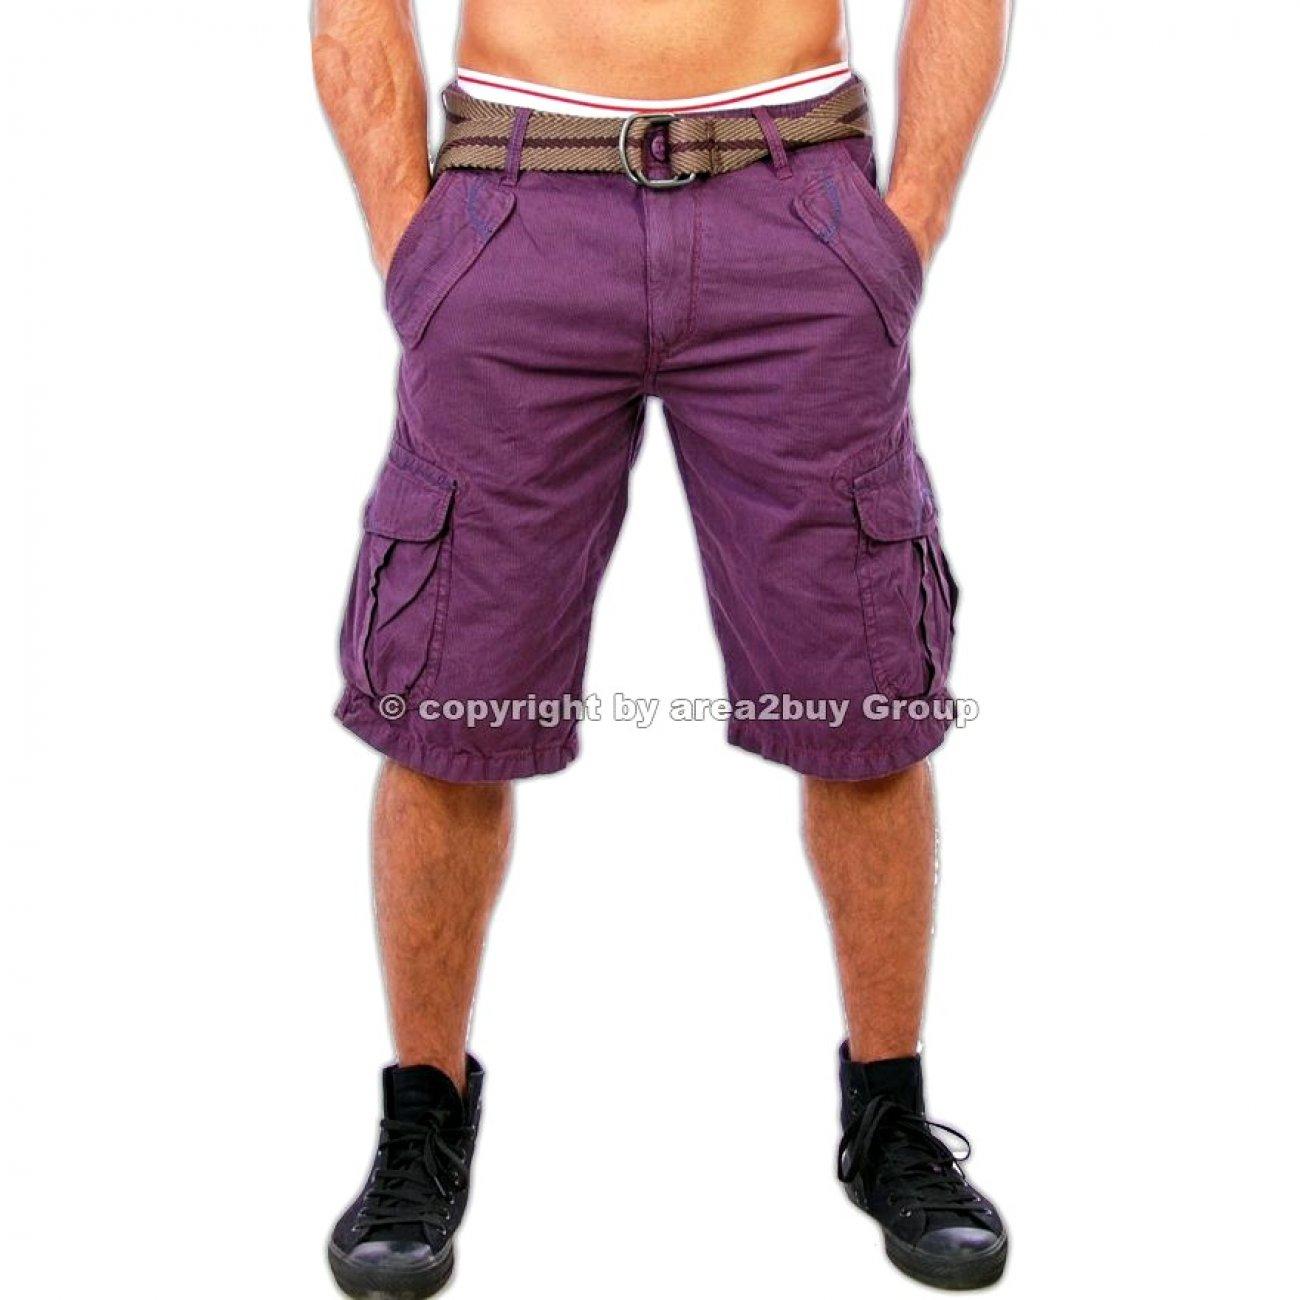 shorts herren lila tazzio 1701 bermuda shorts m nner. Black Bedroom Furniture Sets. Home Design Ideas